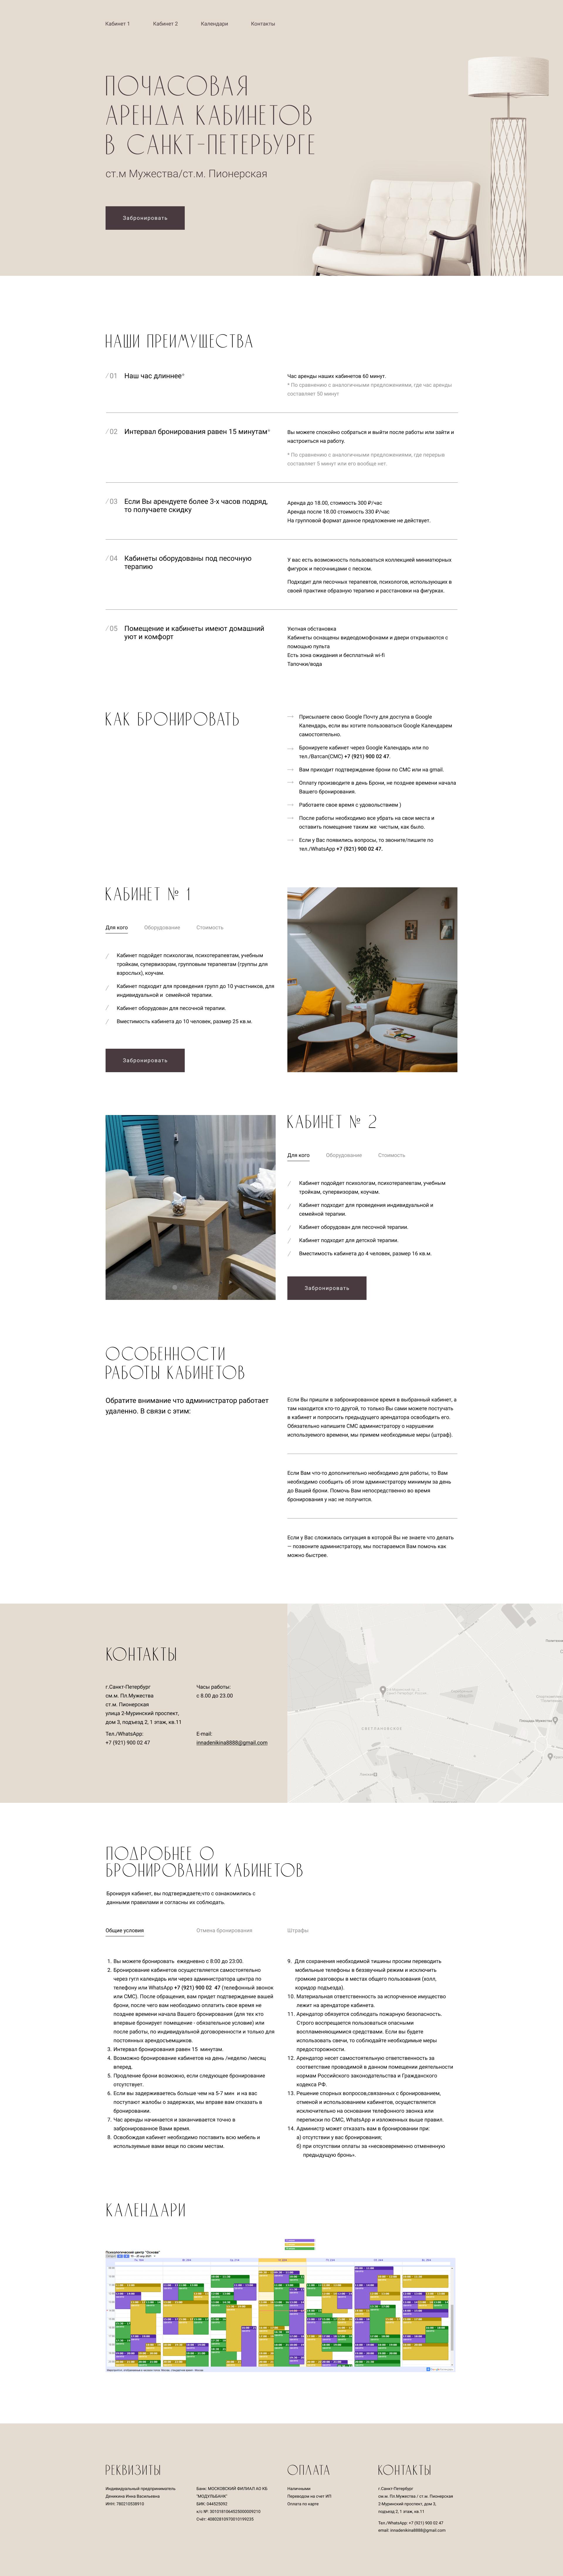 Landing Page Büromiete